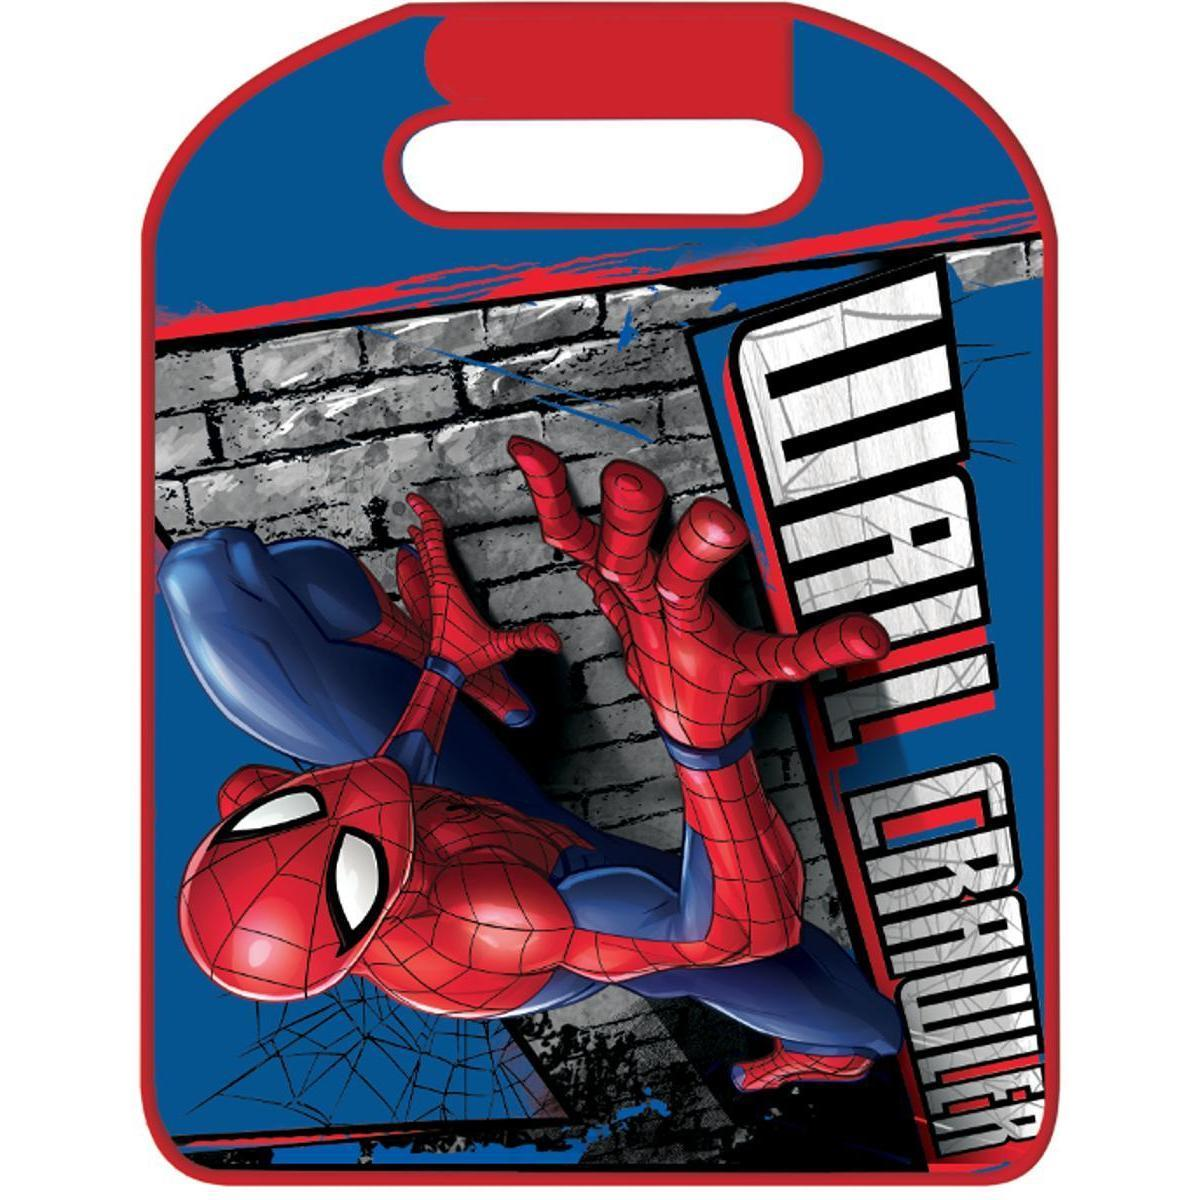 Aparatoare pentru scaun Spiderman Disney Eurasia 25457 imagine